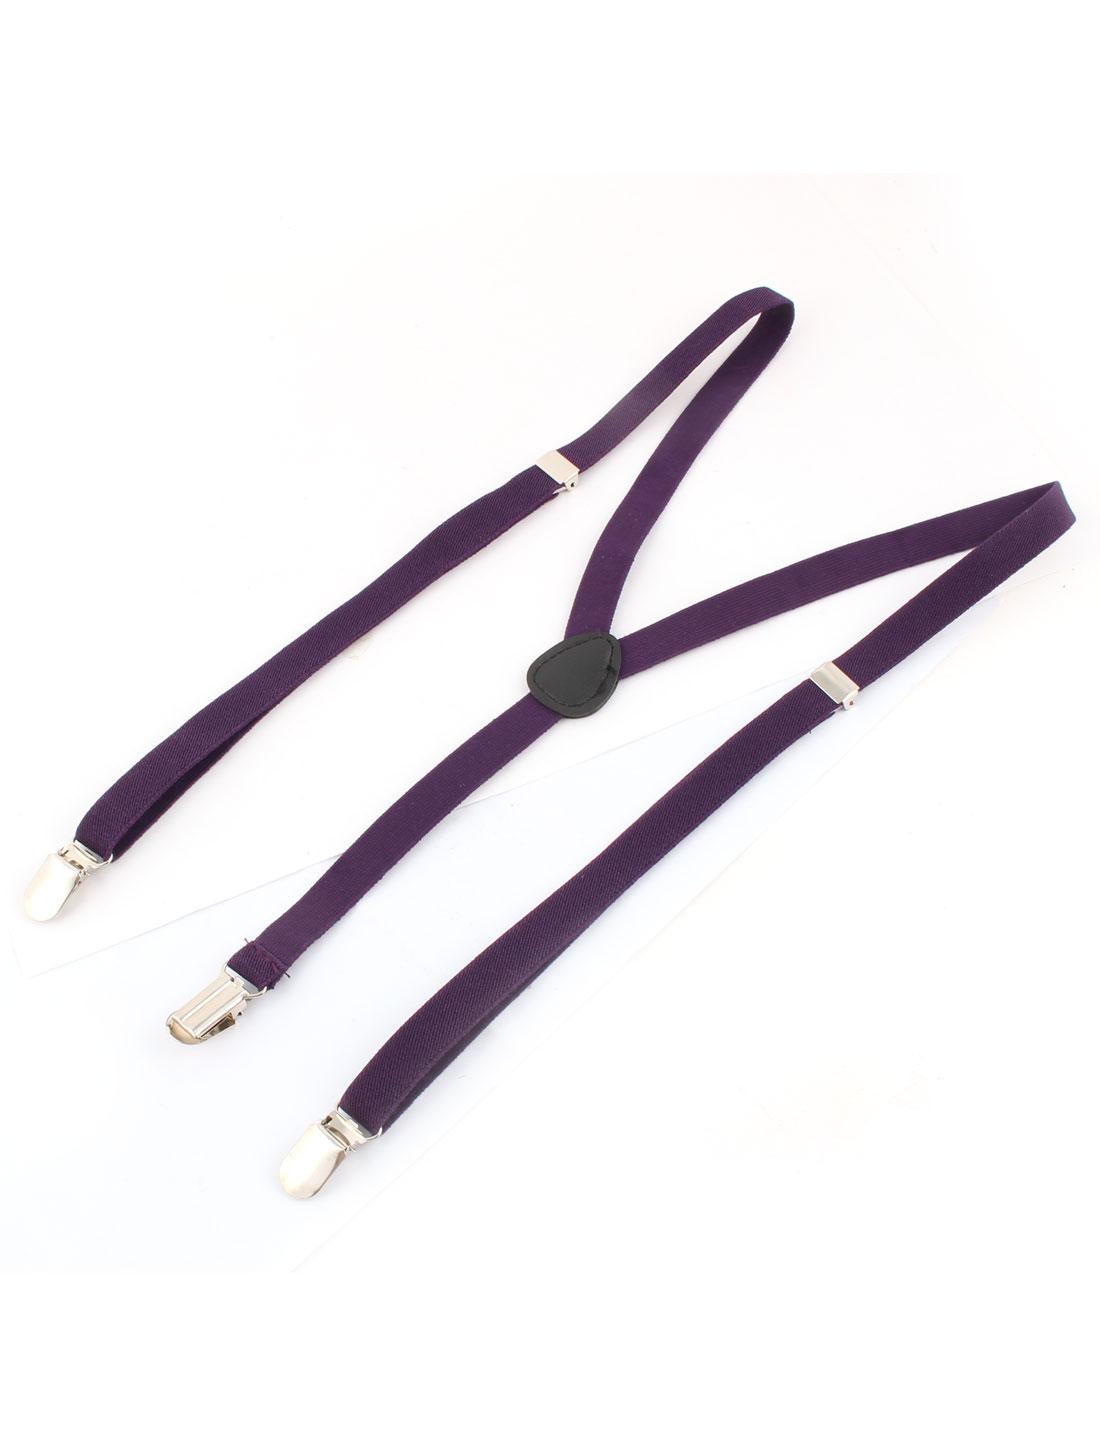 Elastic Fabric Y Shaped Adjustable 3 Clip Galluses Pants Suspender Braces Dark Purple